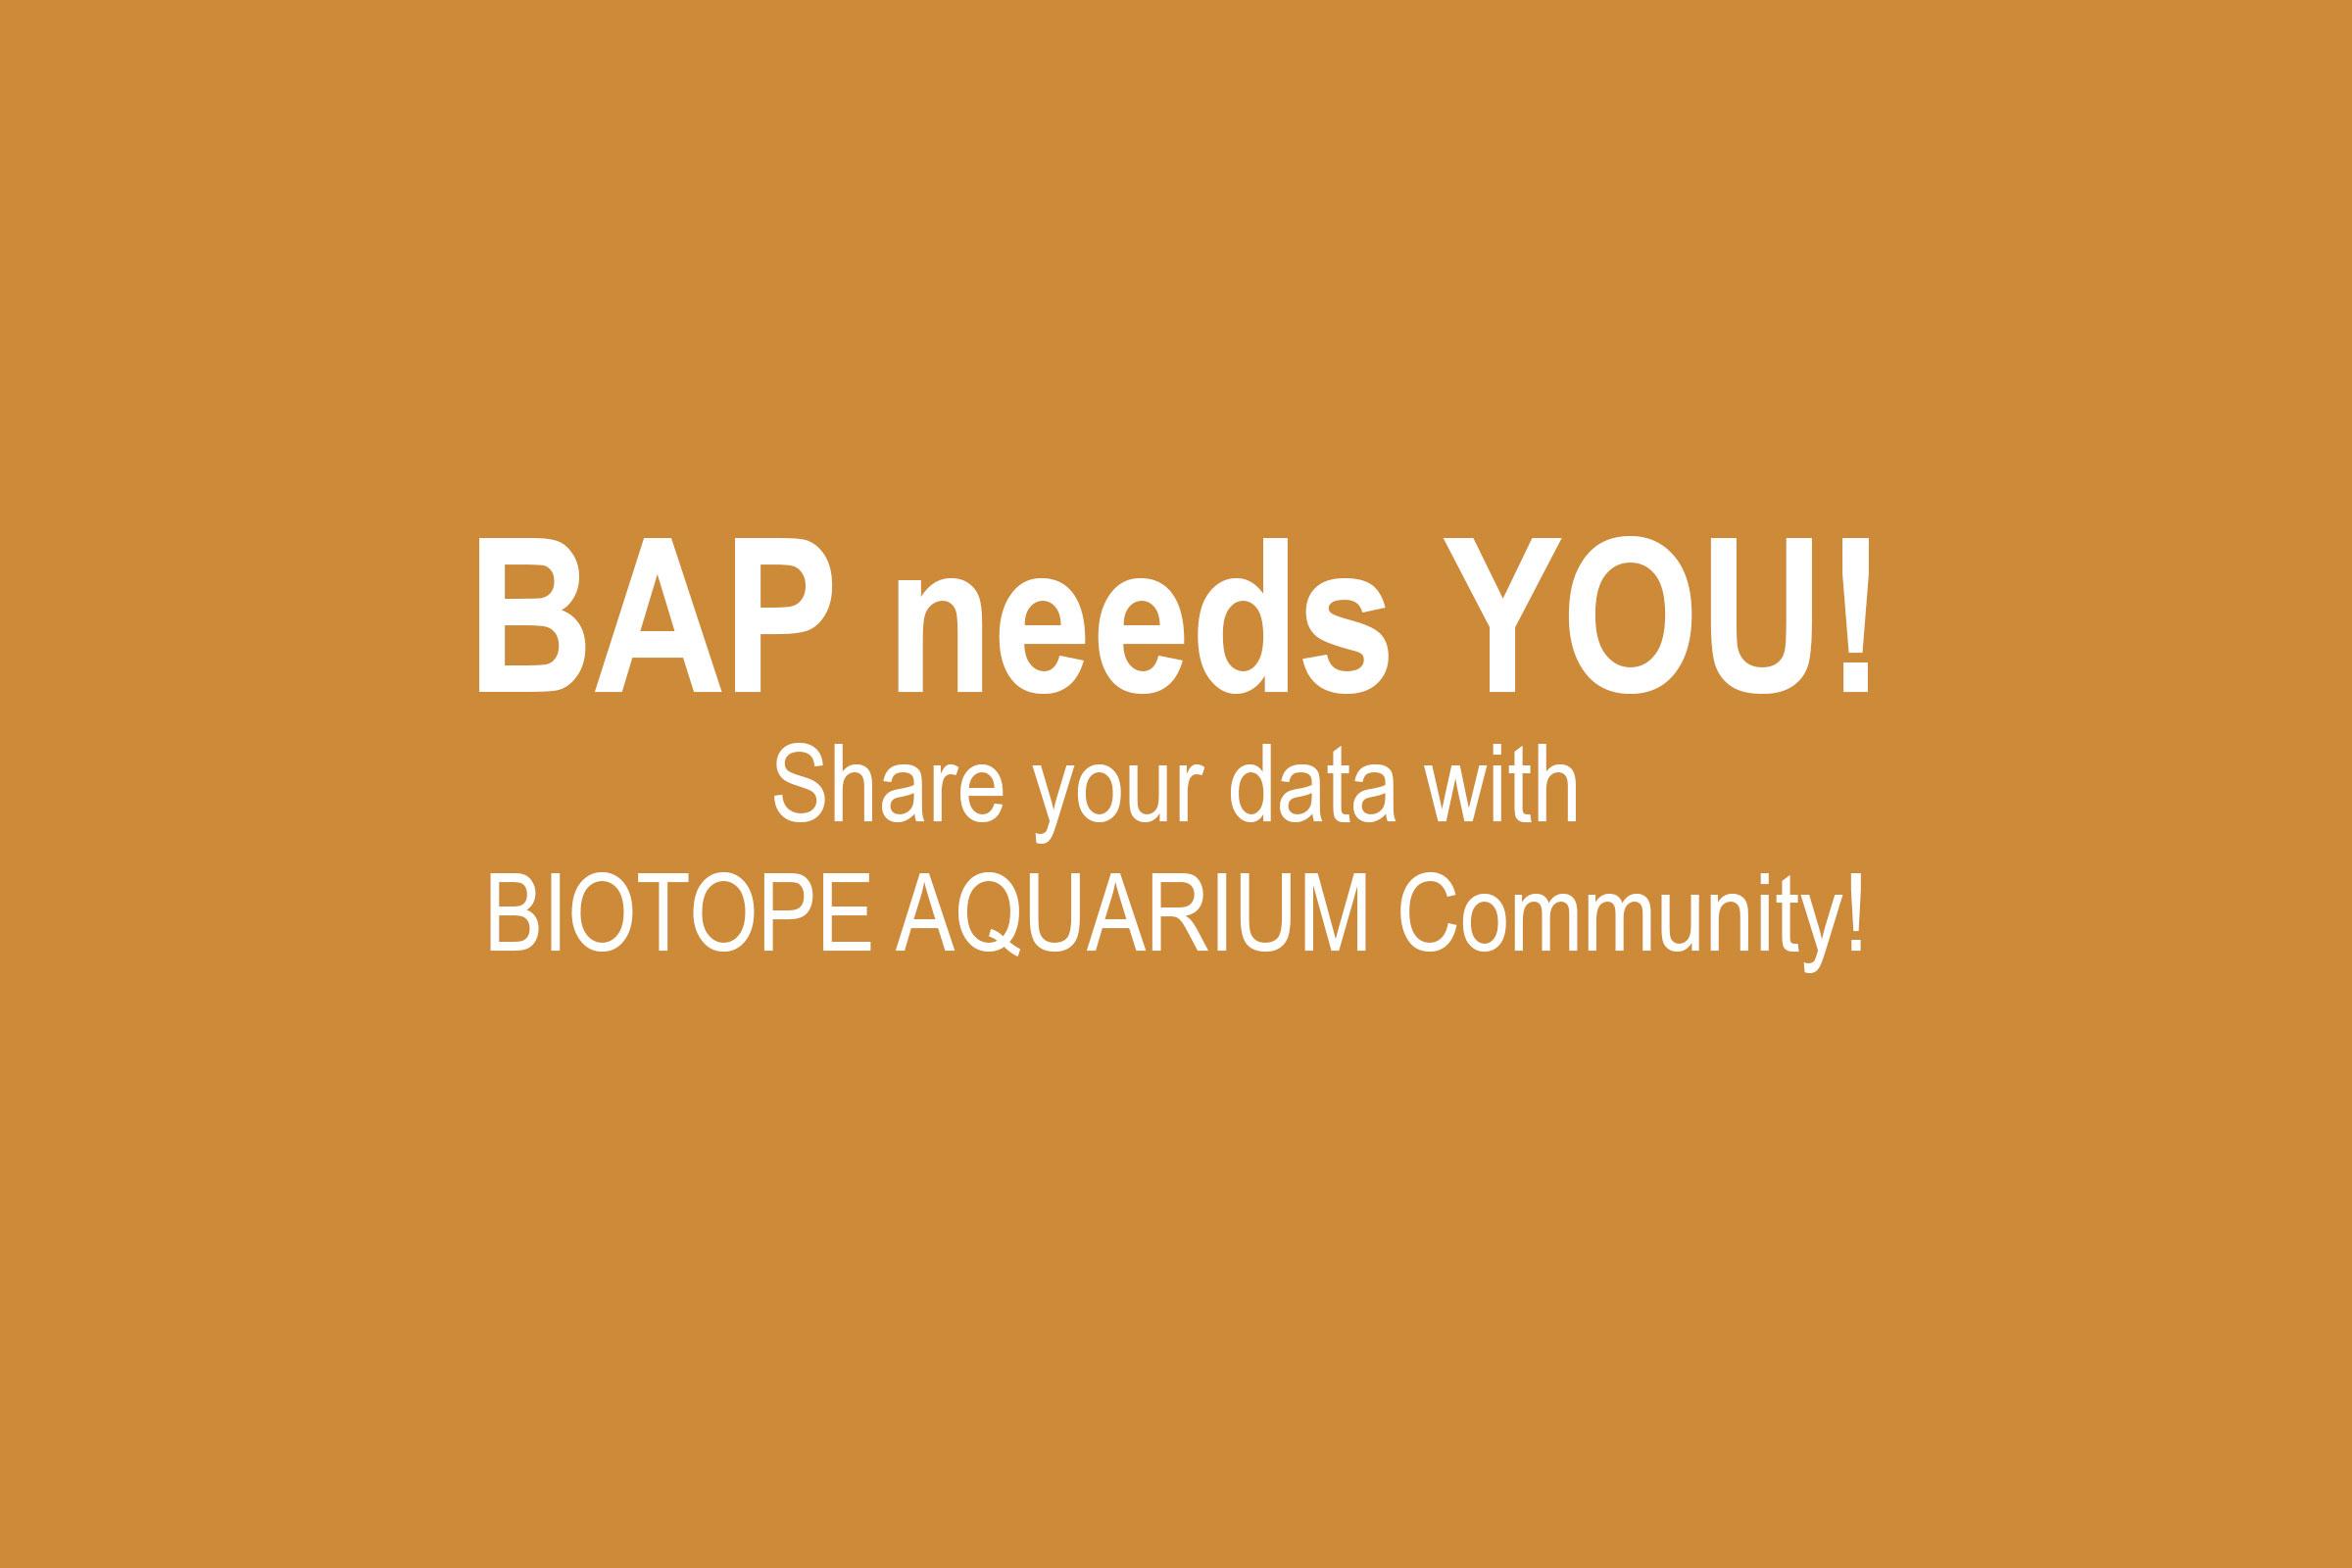 Contribute to BAP Community!